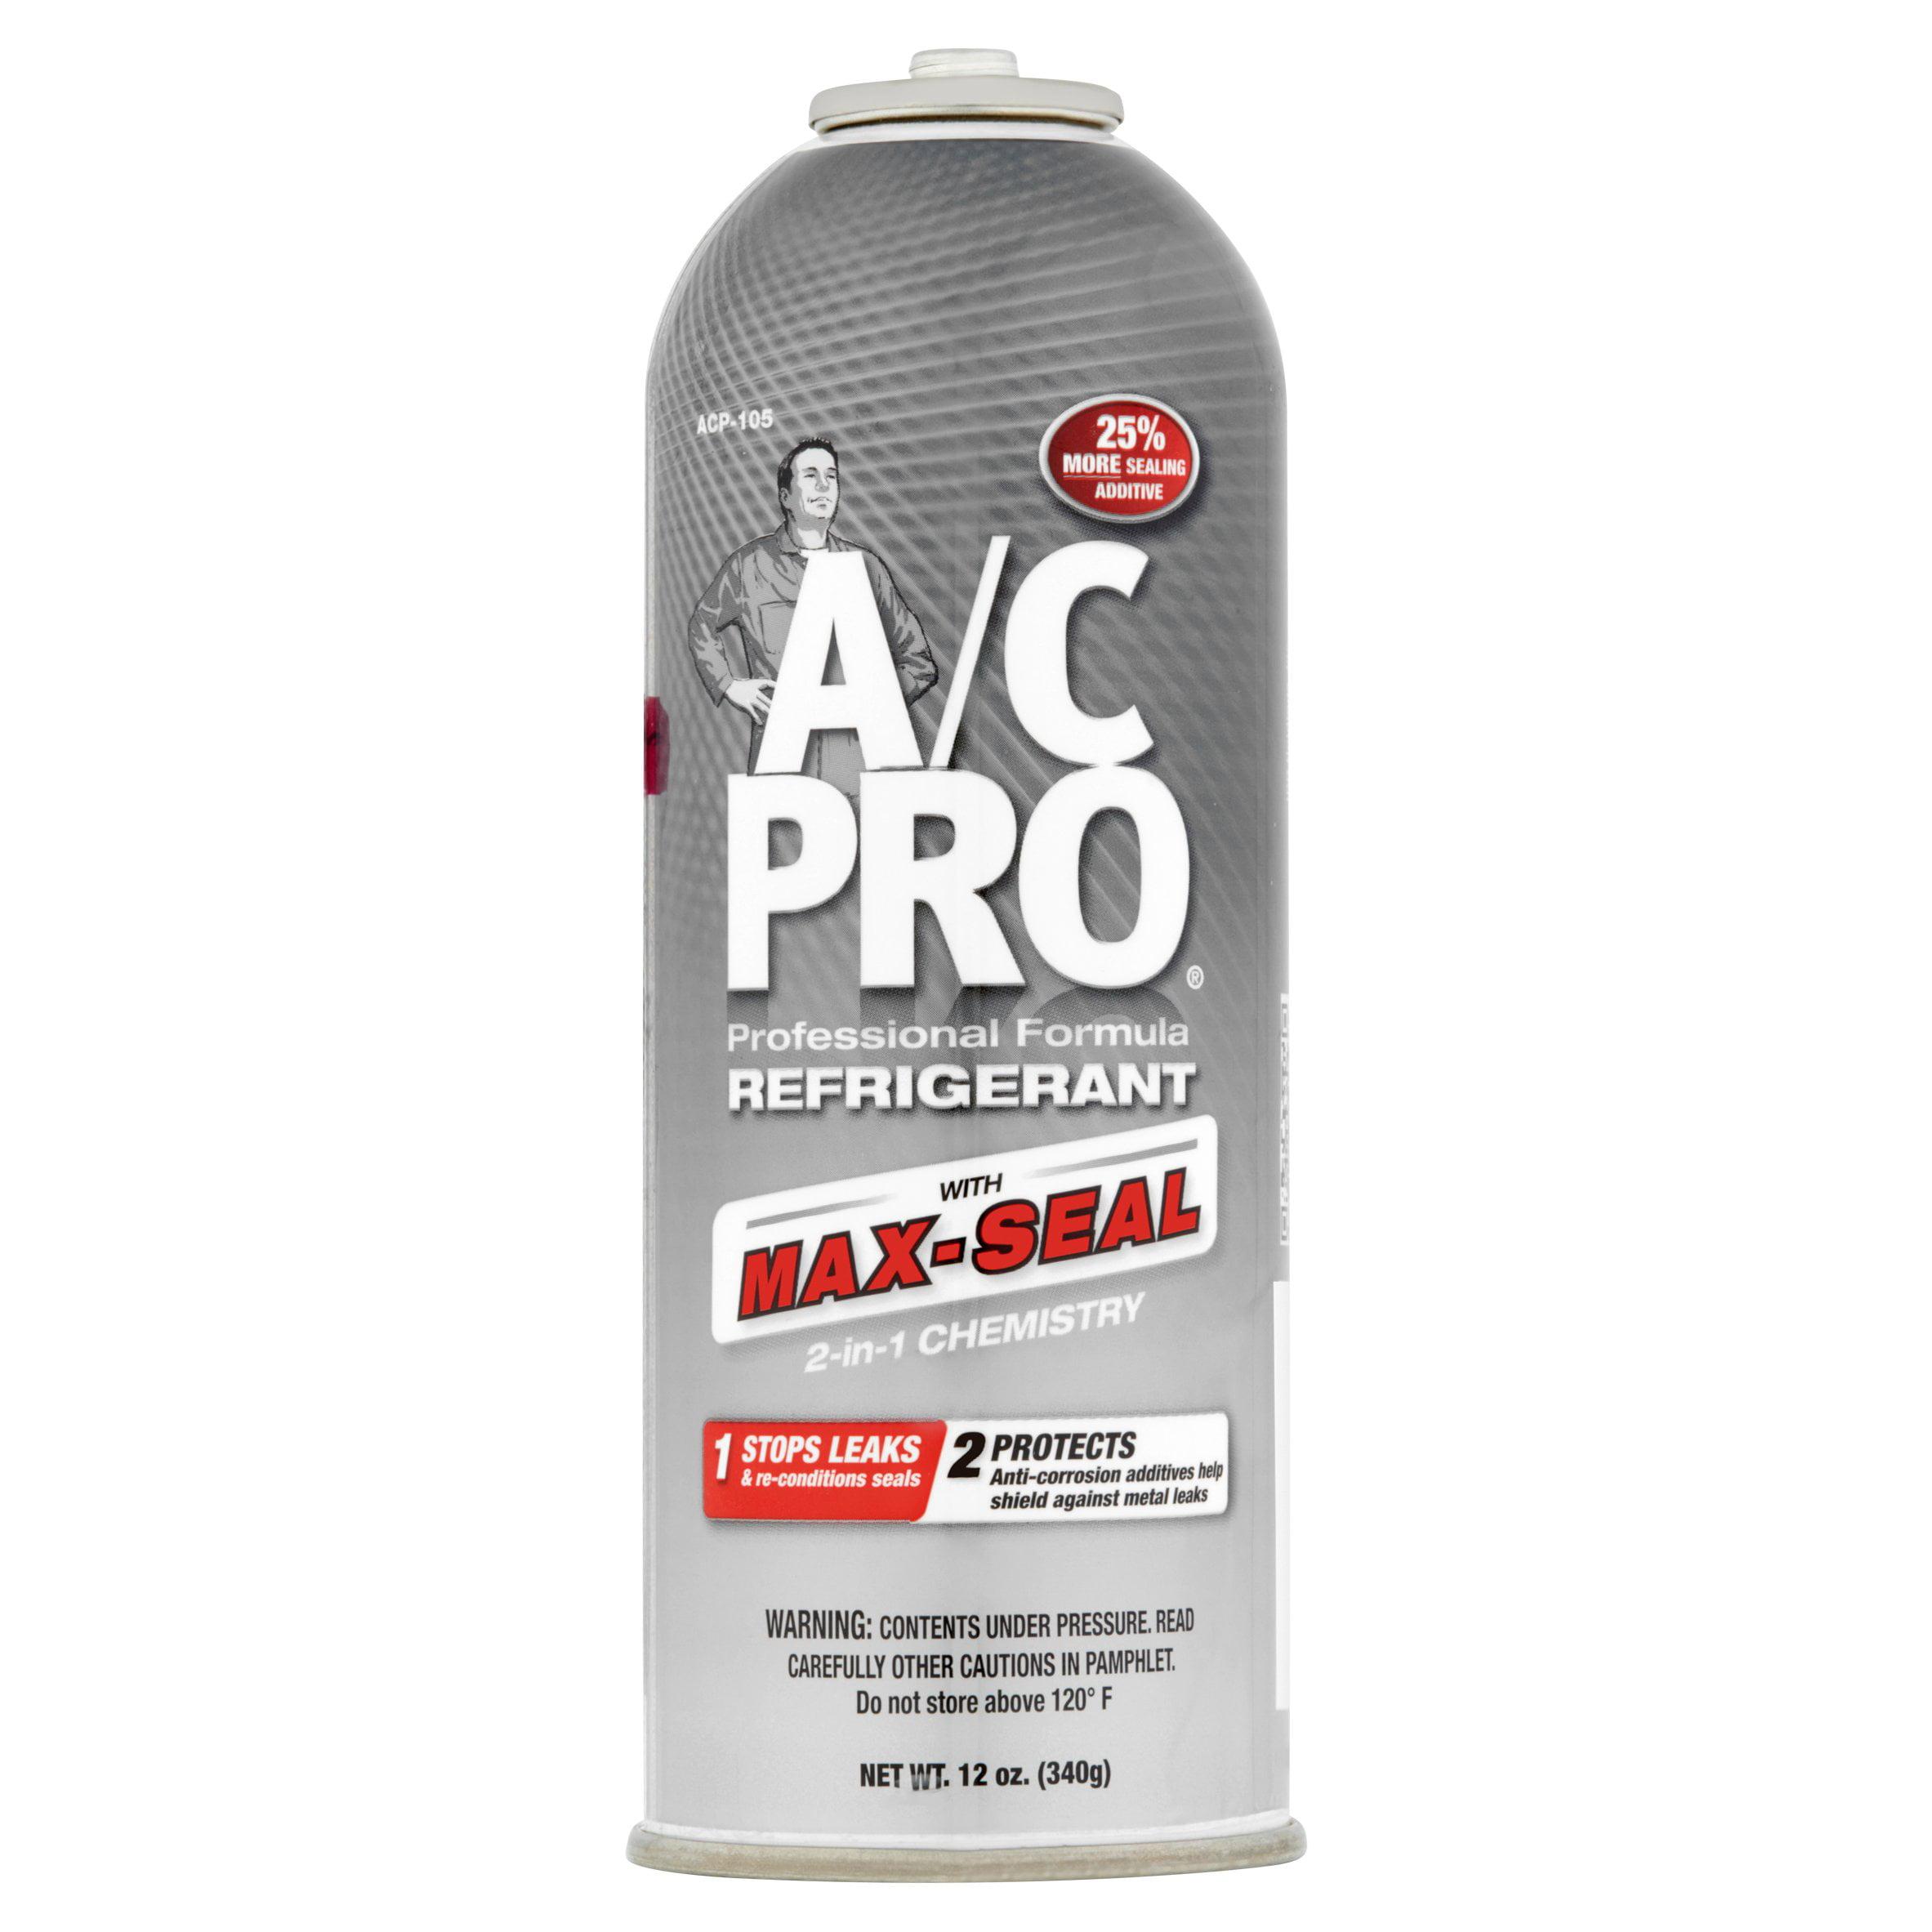 A/C Pro Professional Formula Refrigerant with Max-Seal, 12 oz